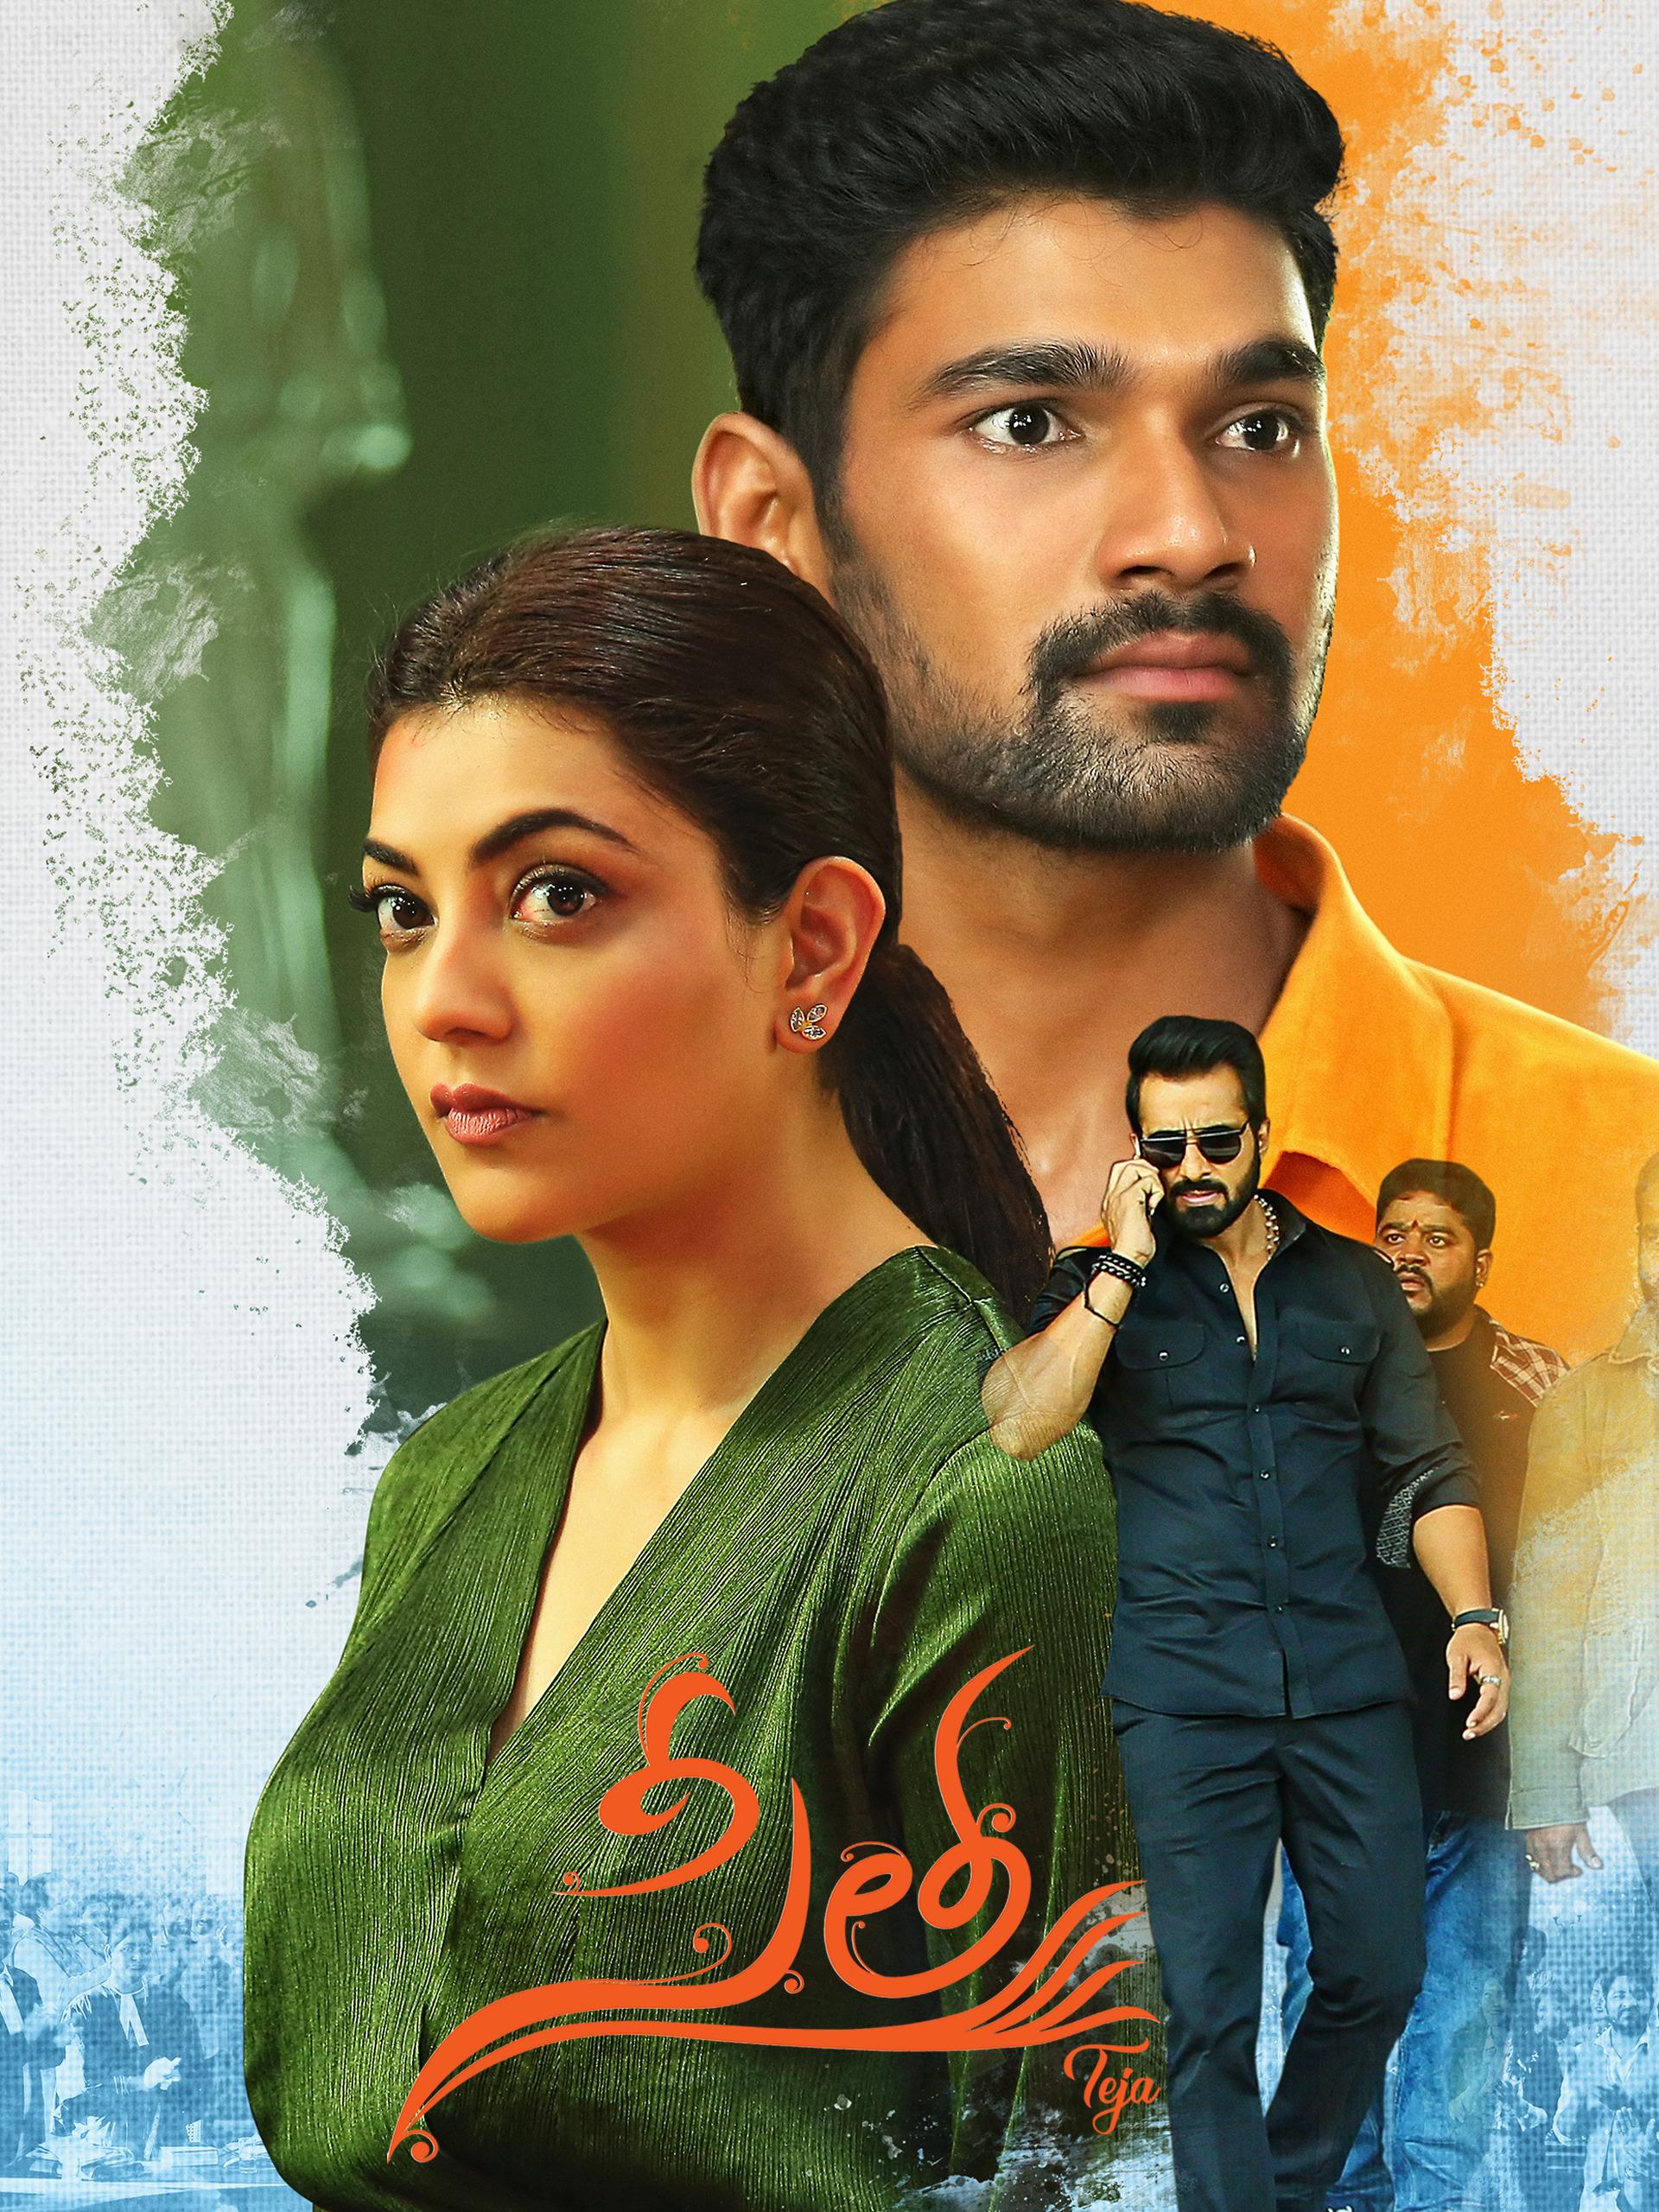 Sita Ram (Seetha) 2020 Official Hindi Dubbed Trailer 720p HDRip Download